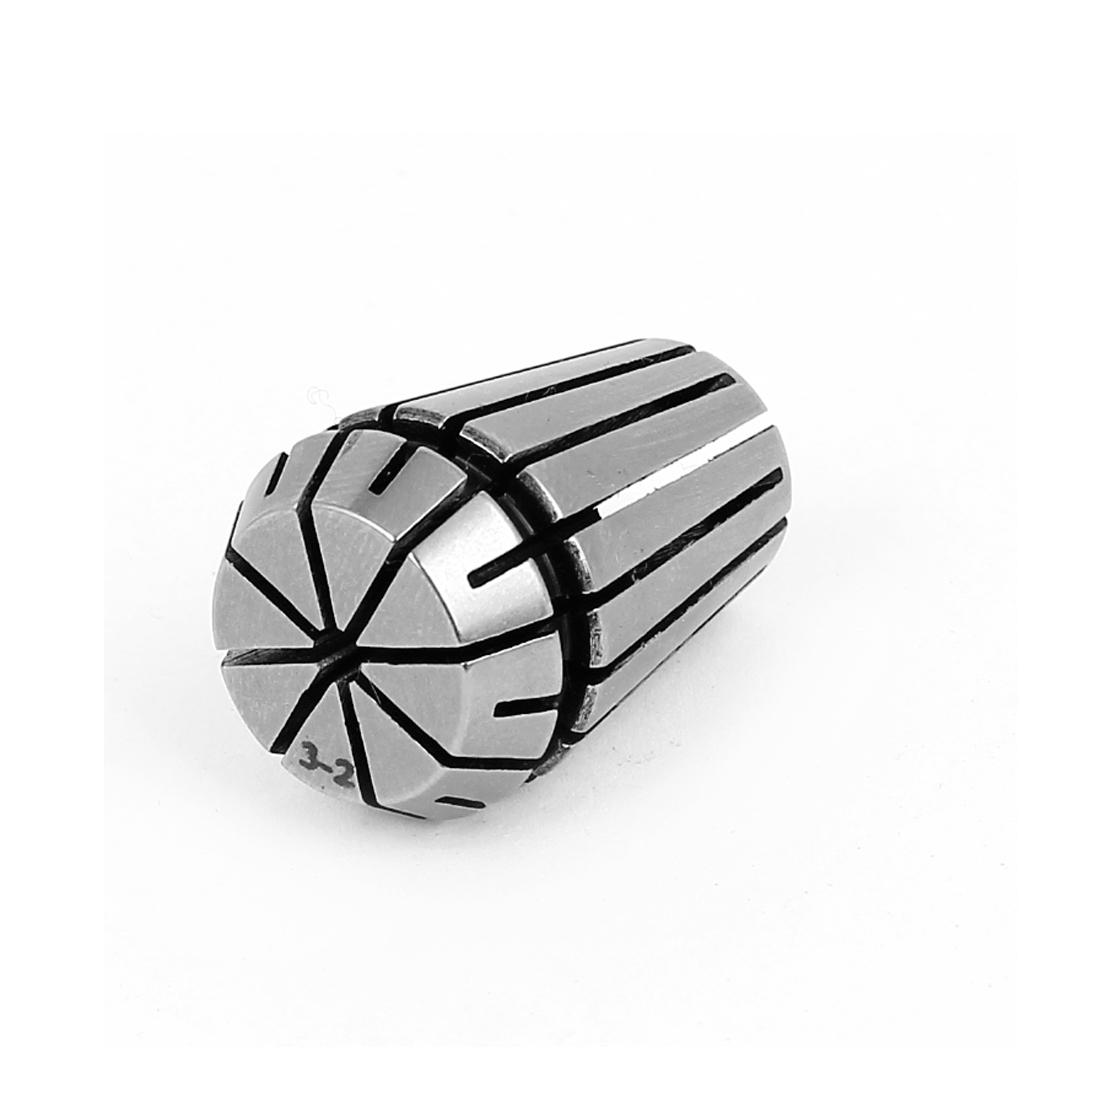 ER20-3 Clamping Range 2-3mm CNC Engraving Milling Machine Spring Collet Chuck